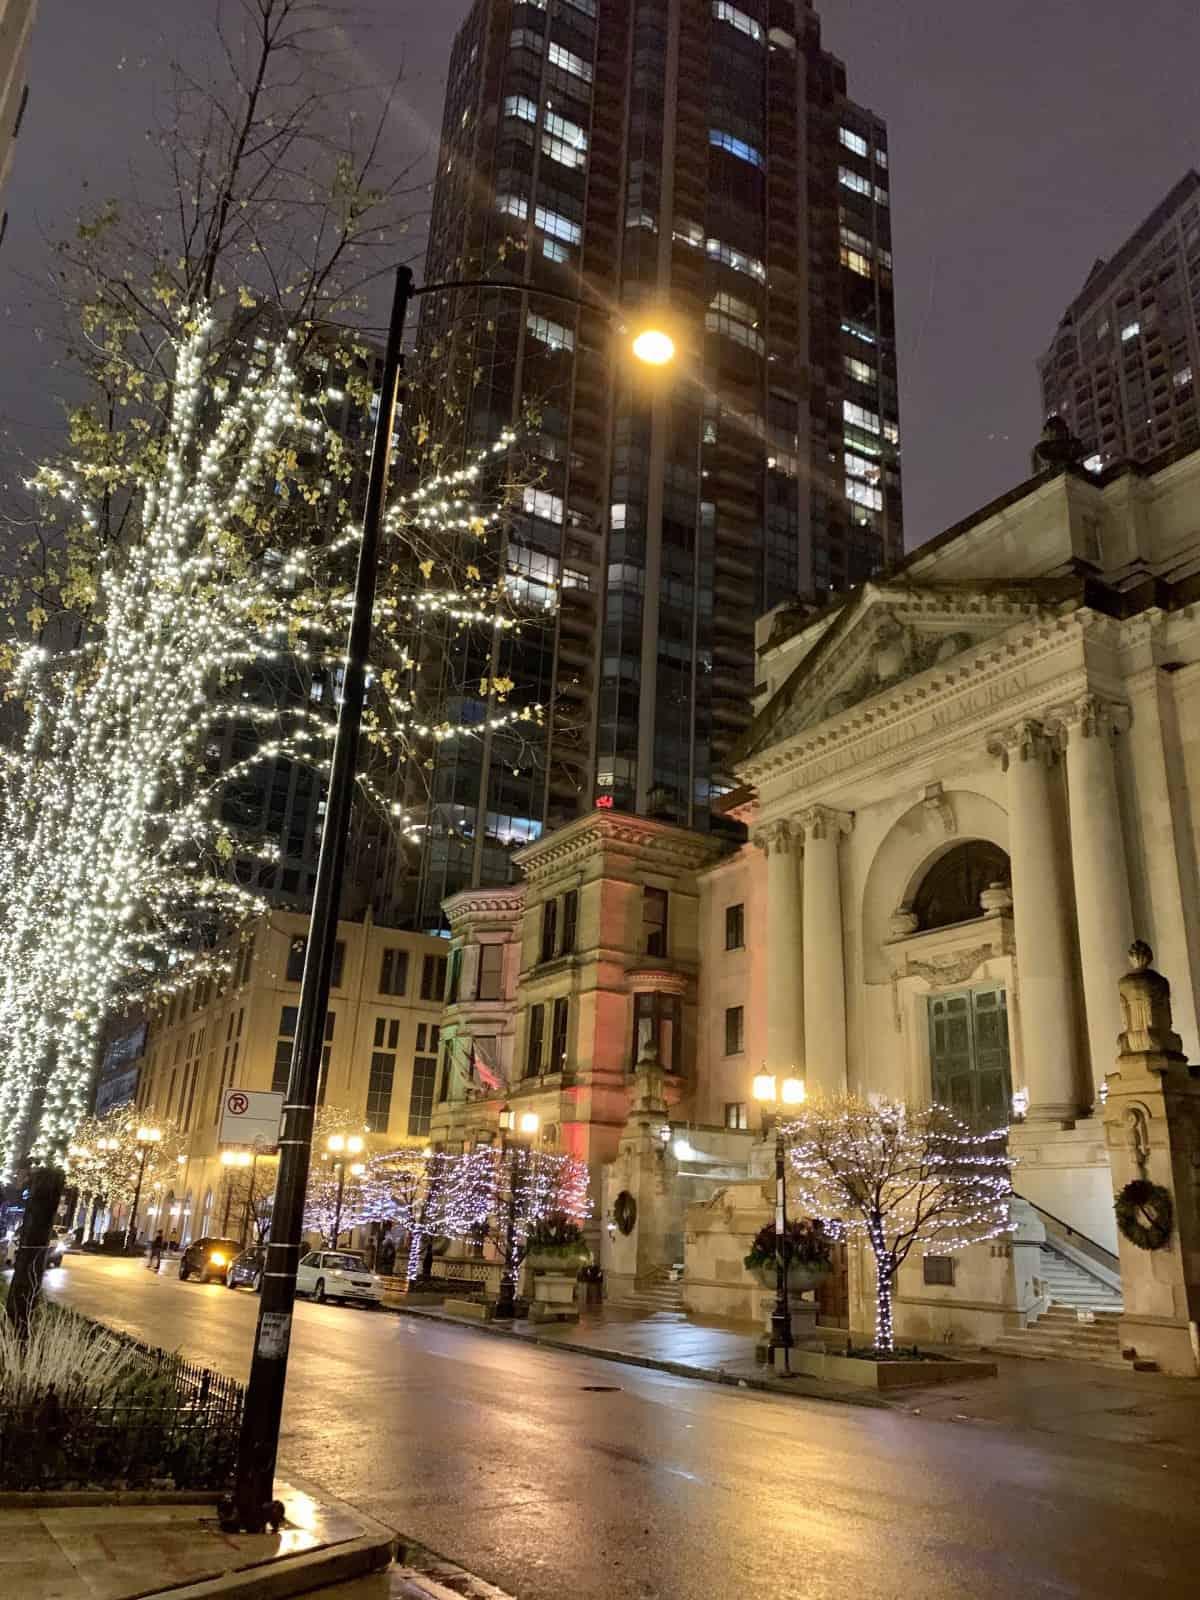 Even in winter Chicago sparkles